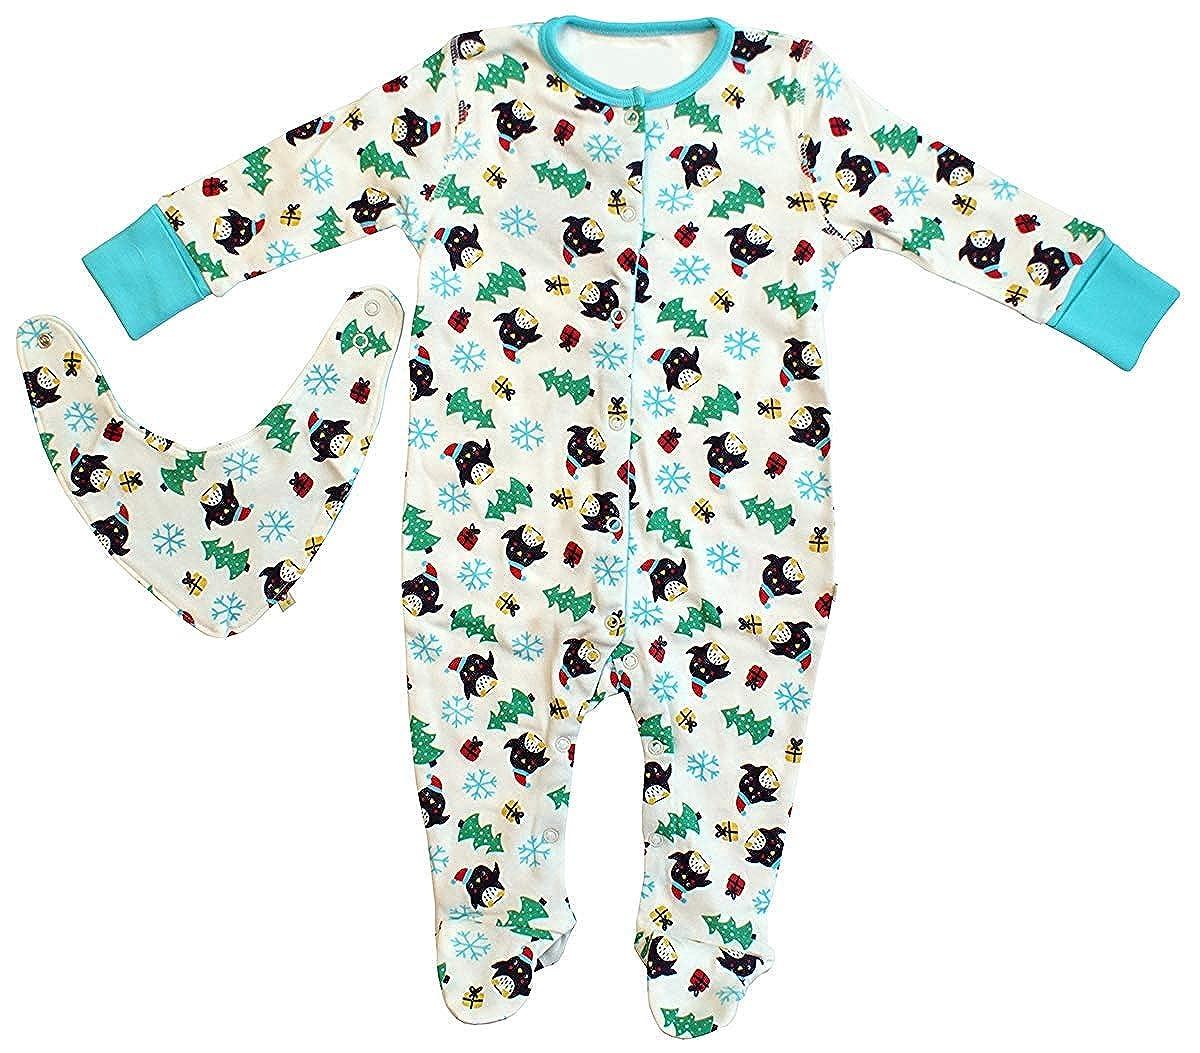 Baby Xmas Penguin Sleepsuit /& Bib Cotton Set Sizes from Newborn to 24 Months